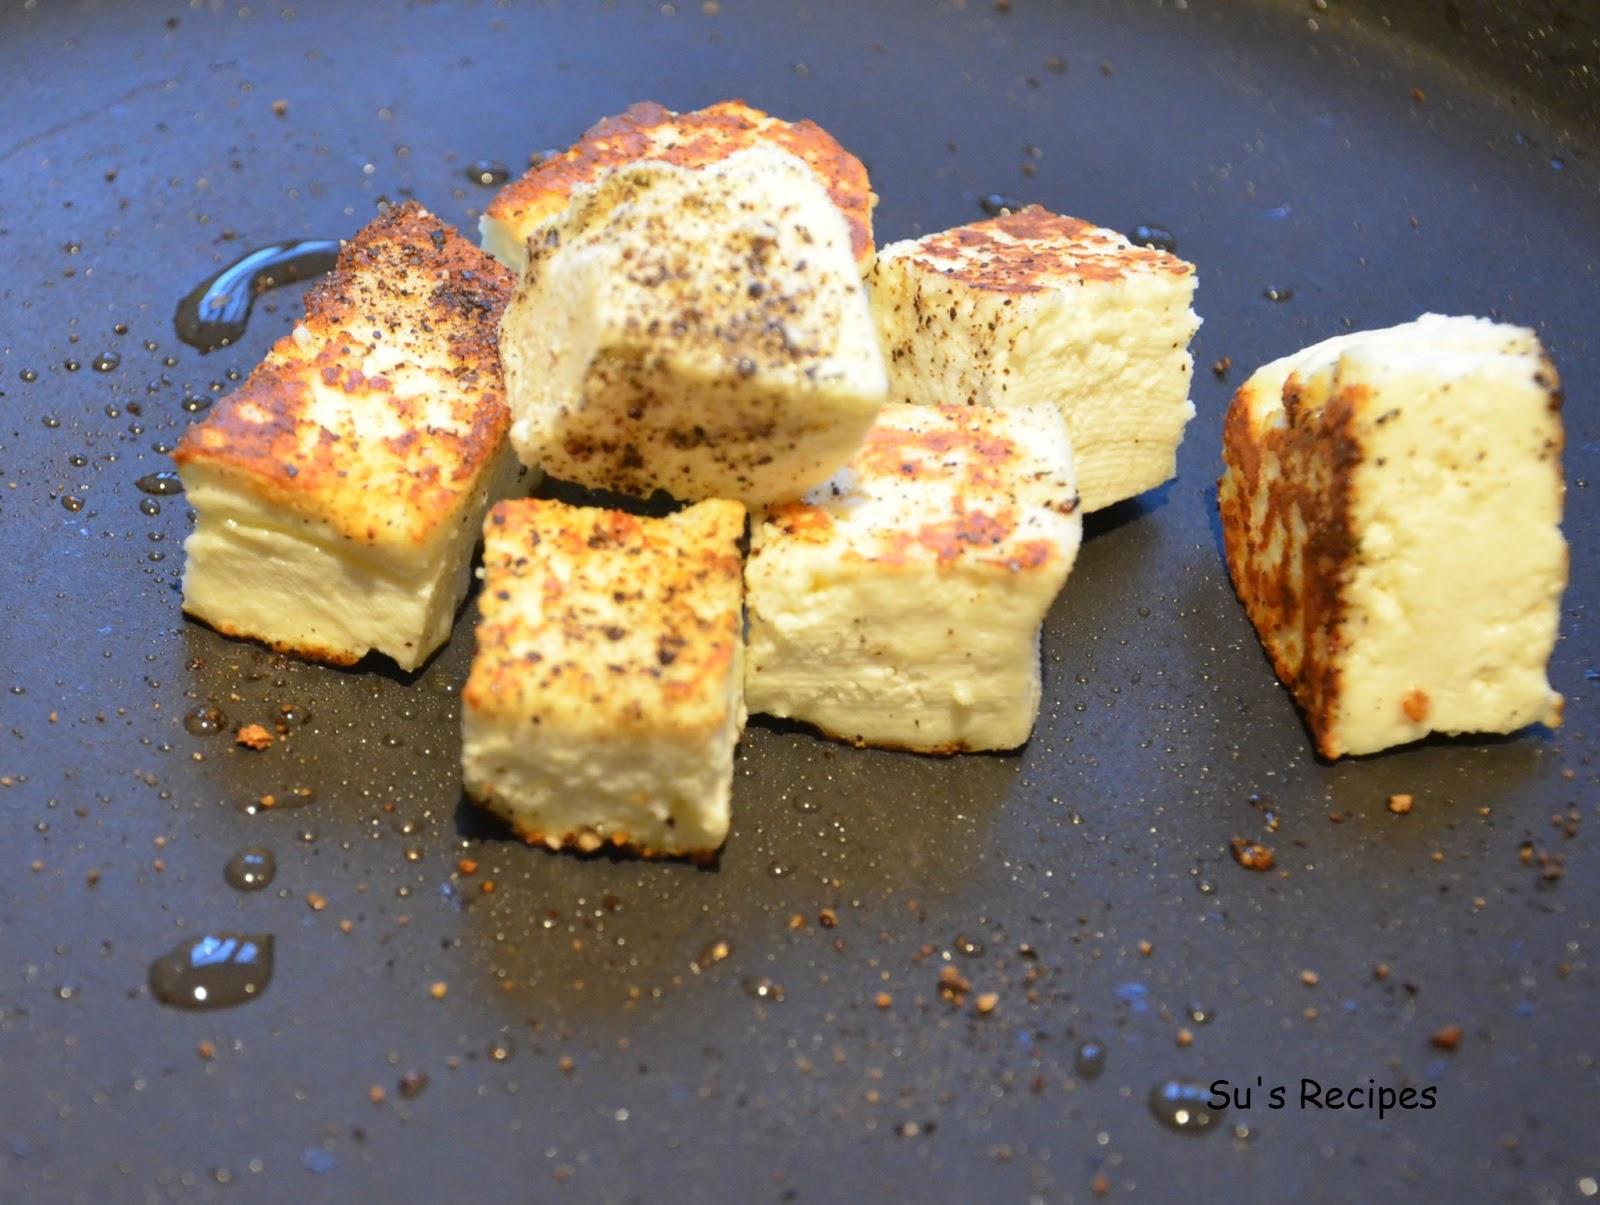 Su 39 S Recipes Paneer Homemade Cottage Cheese